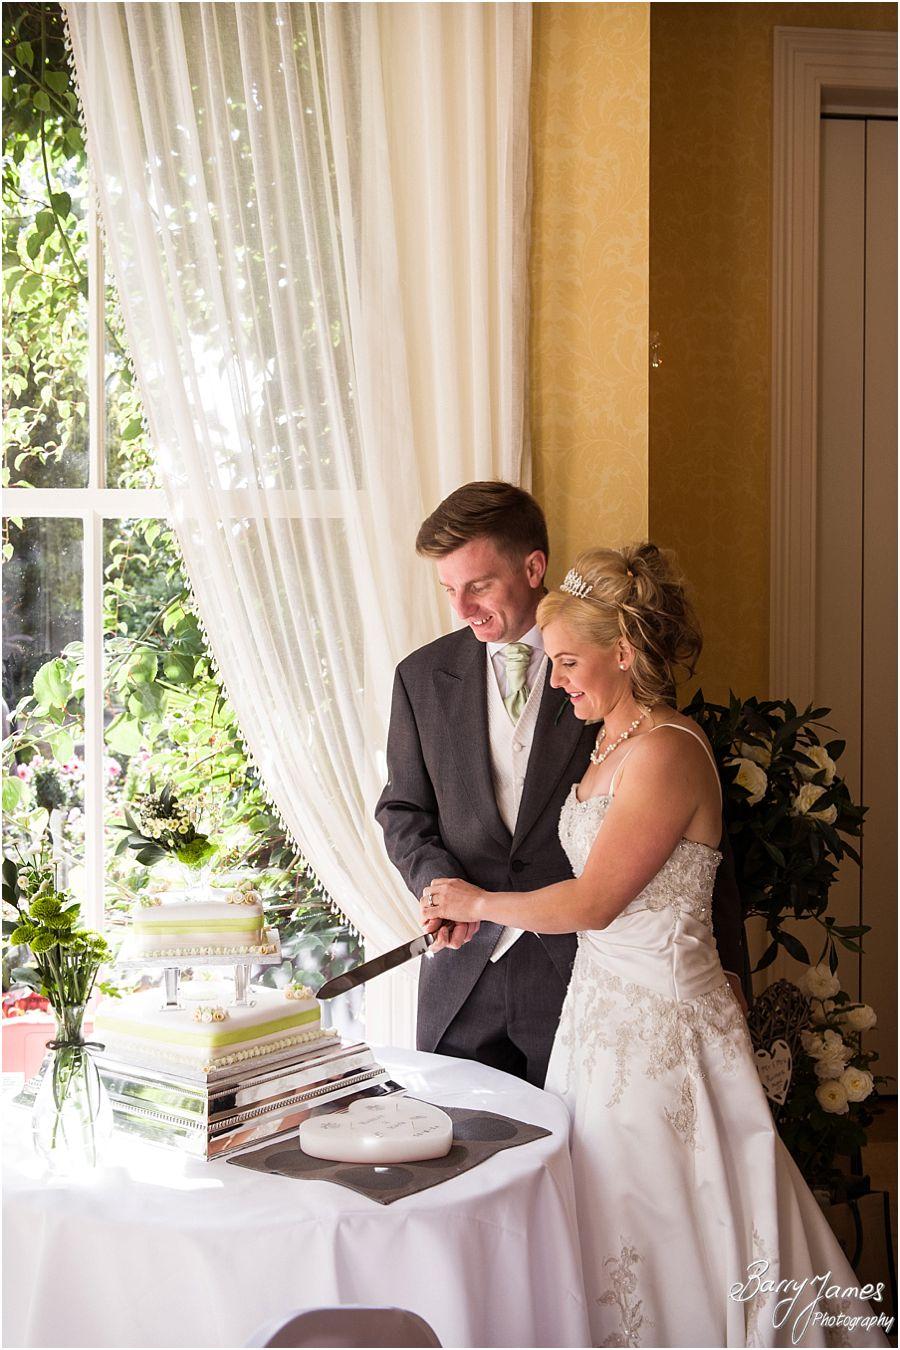 Beautiful room for wedding breakfast at Rodbaston Hall in Penkridge by Cannock Wedding Photographer Barry James